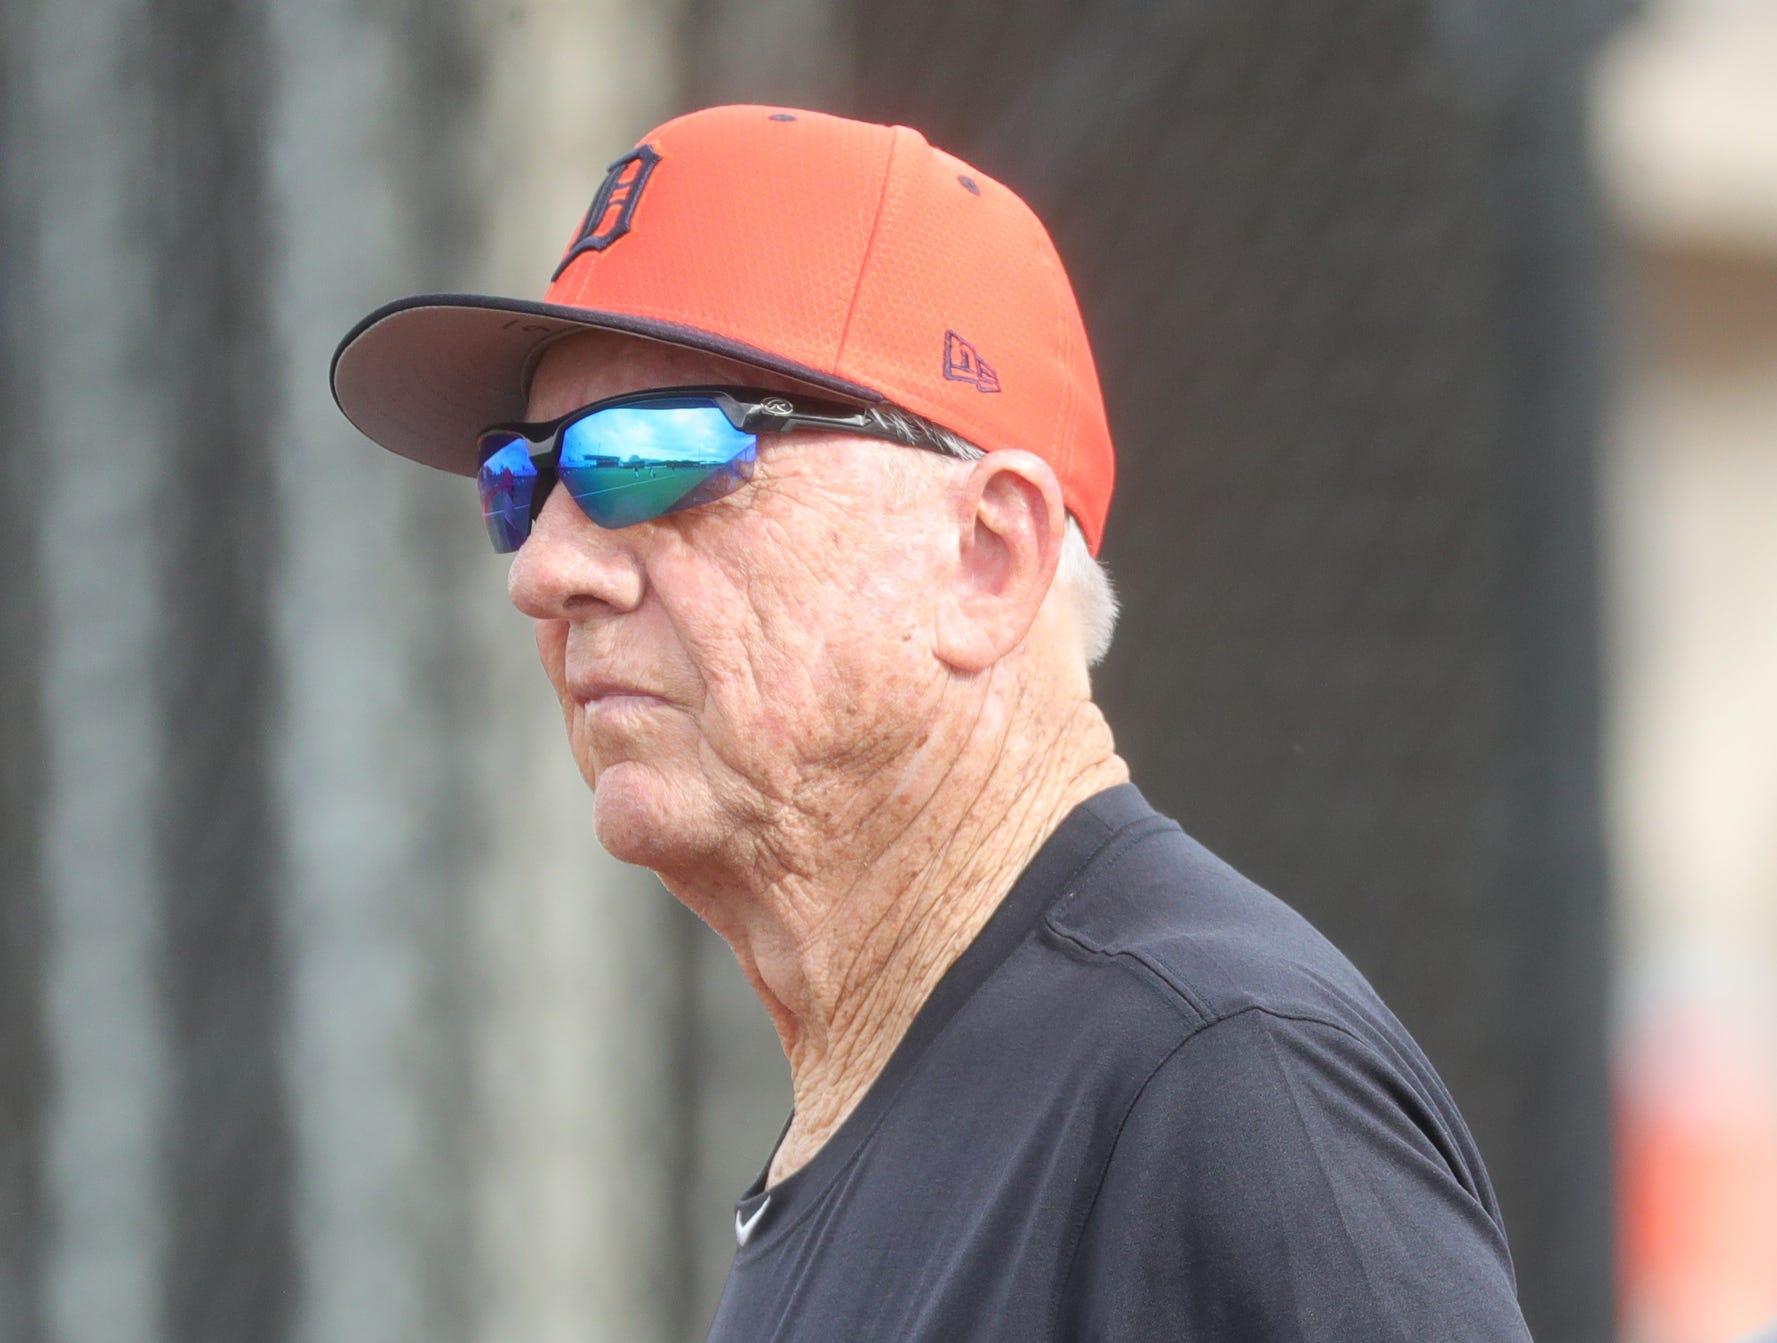 Tigers Hall of Famer Al Kaline watches batting practice during spring training Wednesday, Feb. 20, 2019, at Joker Marchant Stadium in Lakeland, Fla.